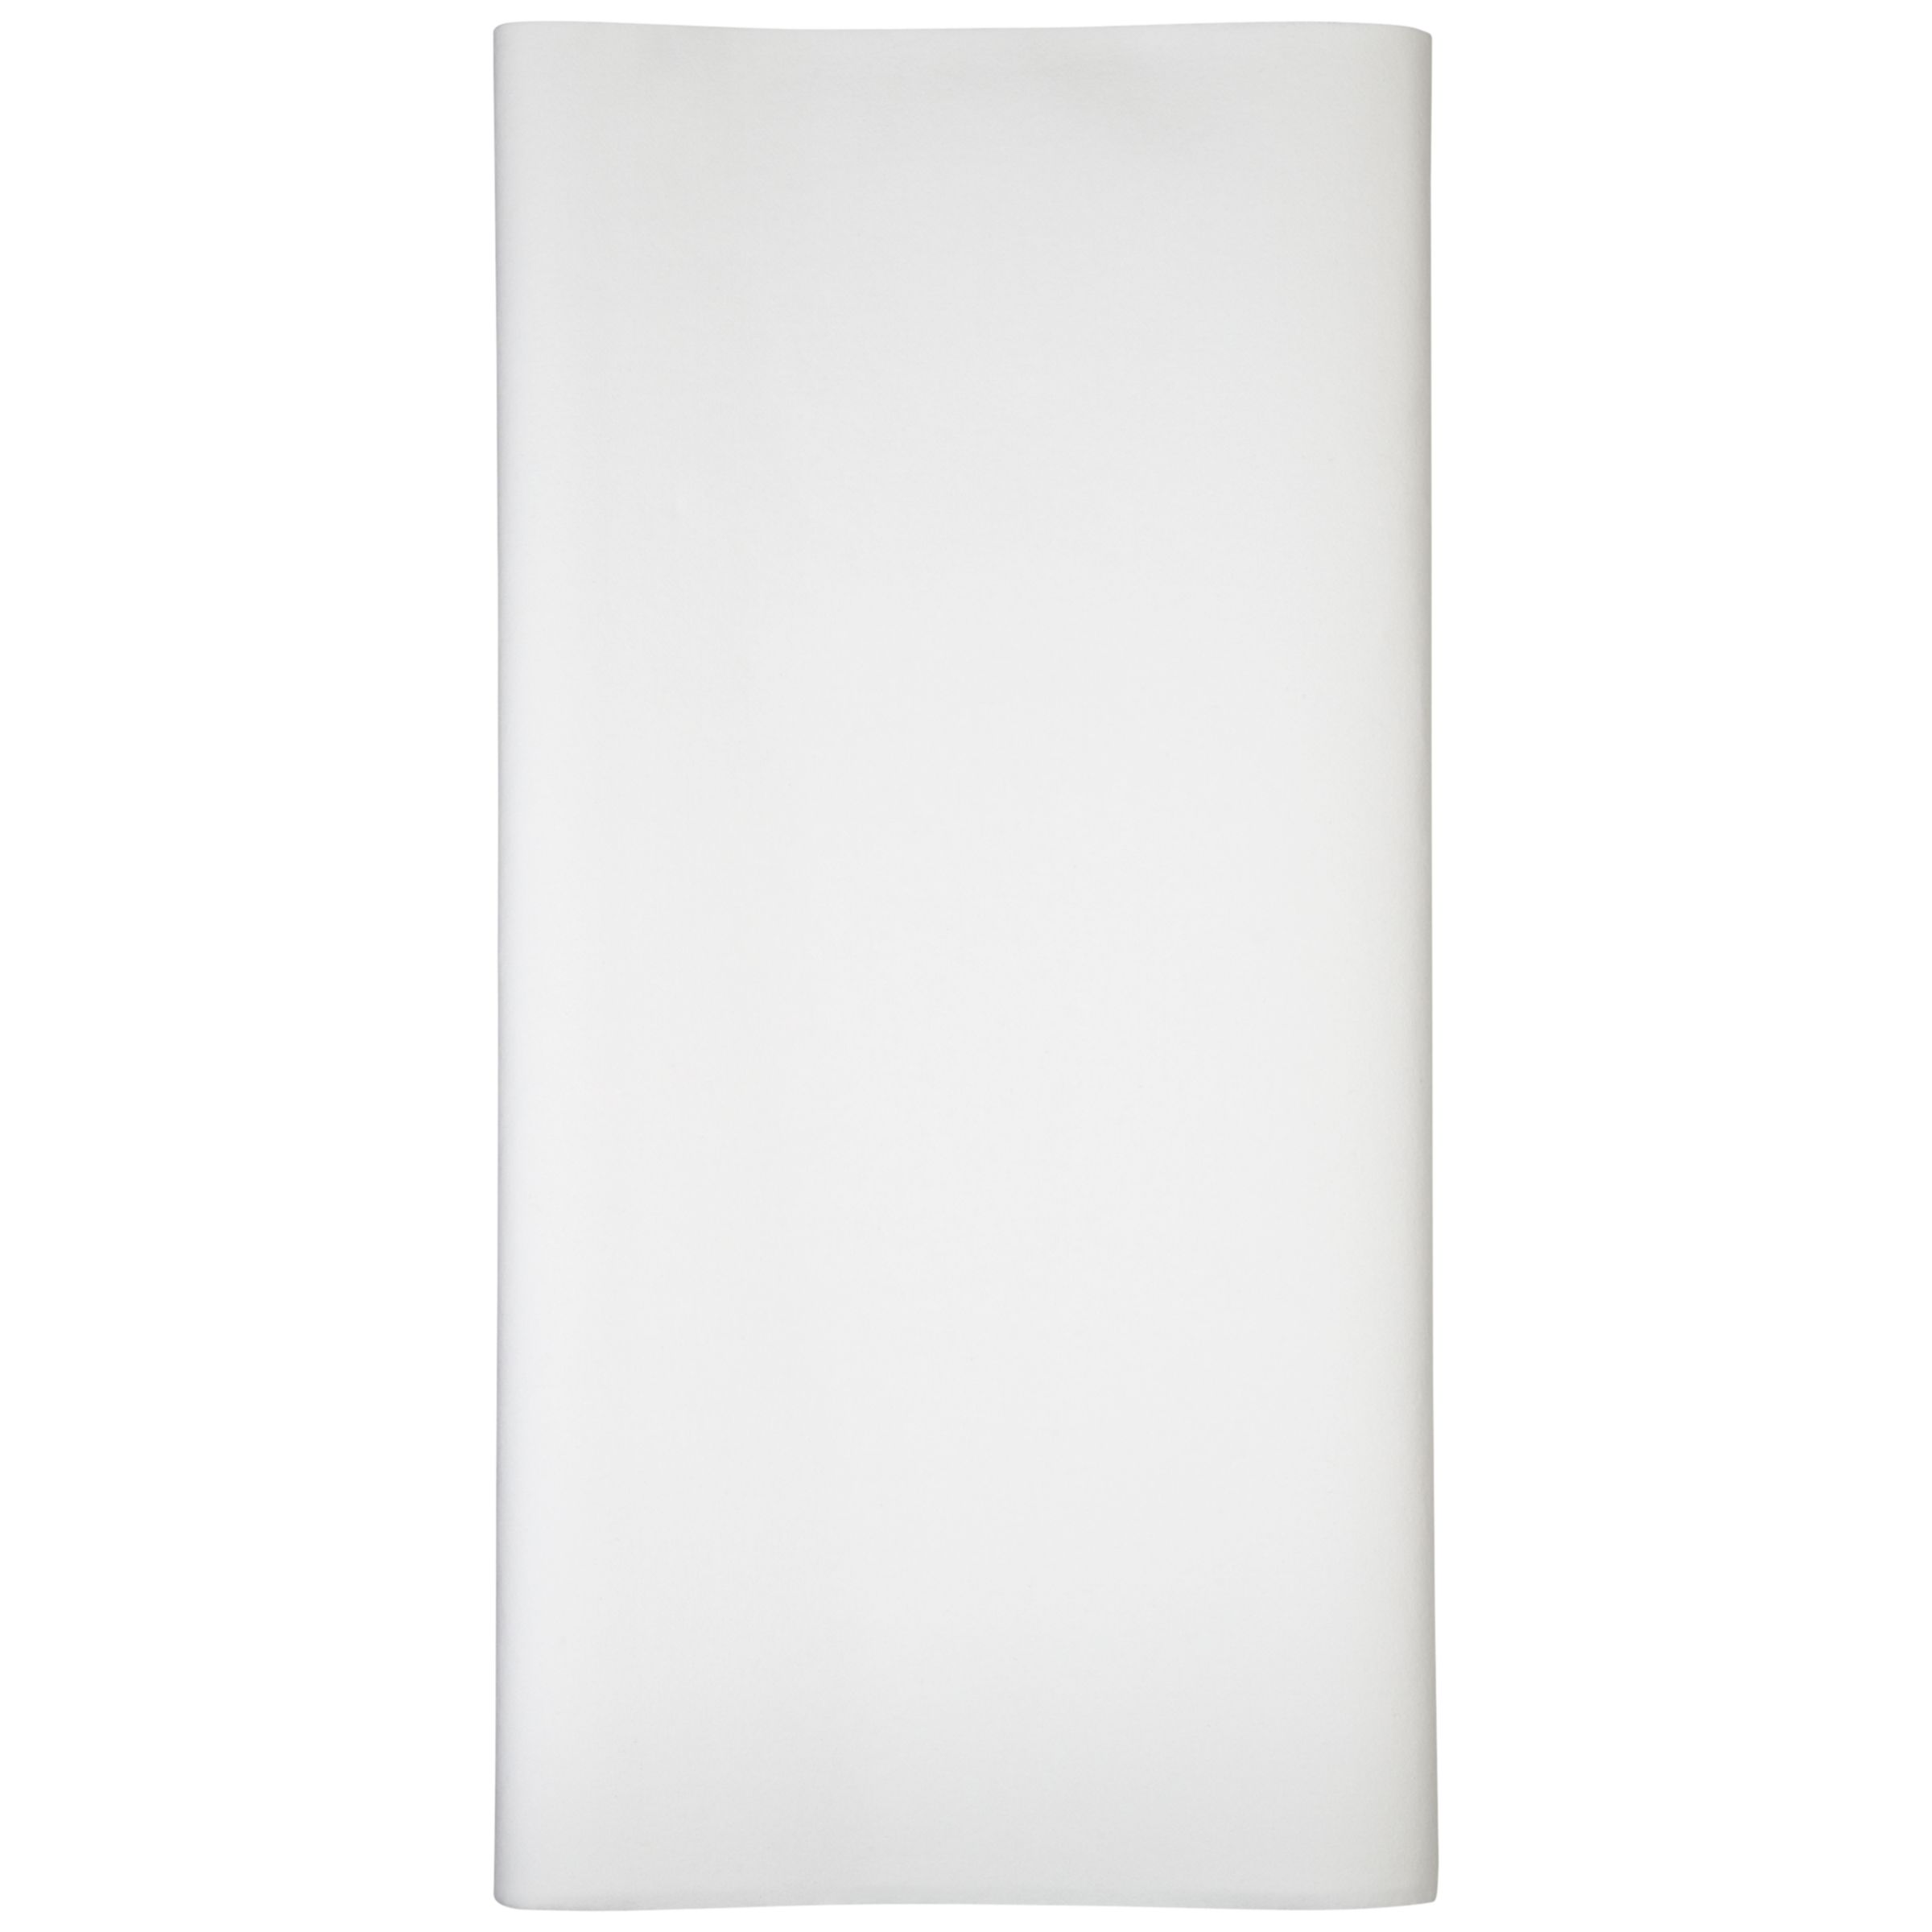 Duni Duni Tablecover 125 x 180cm, White